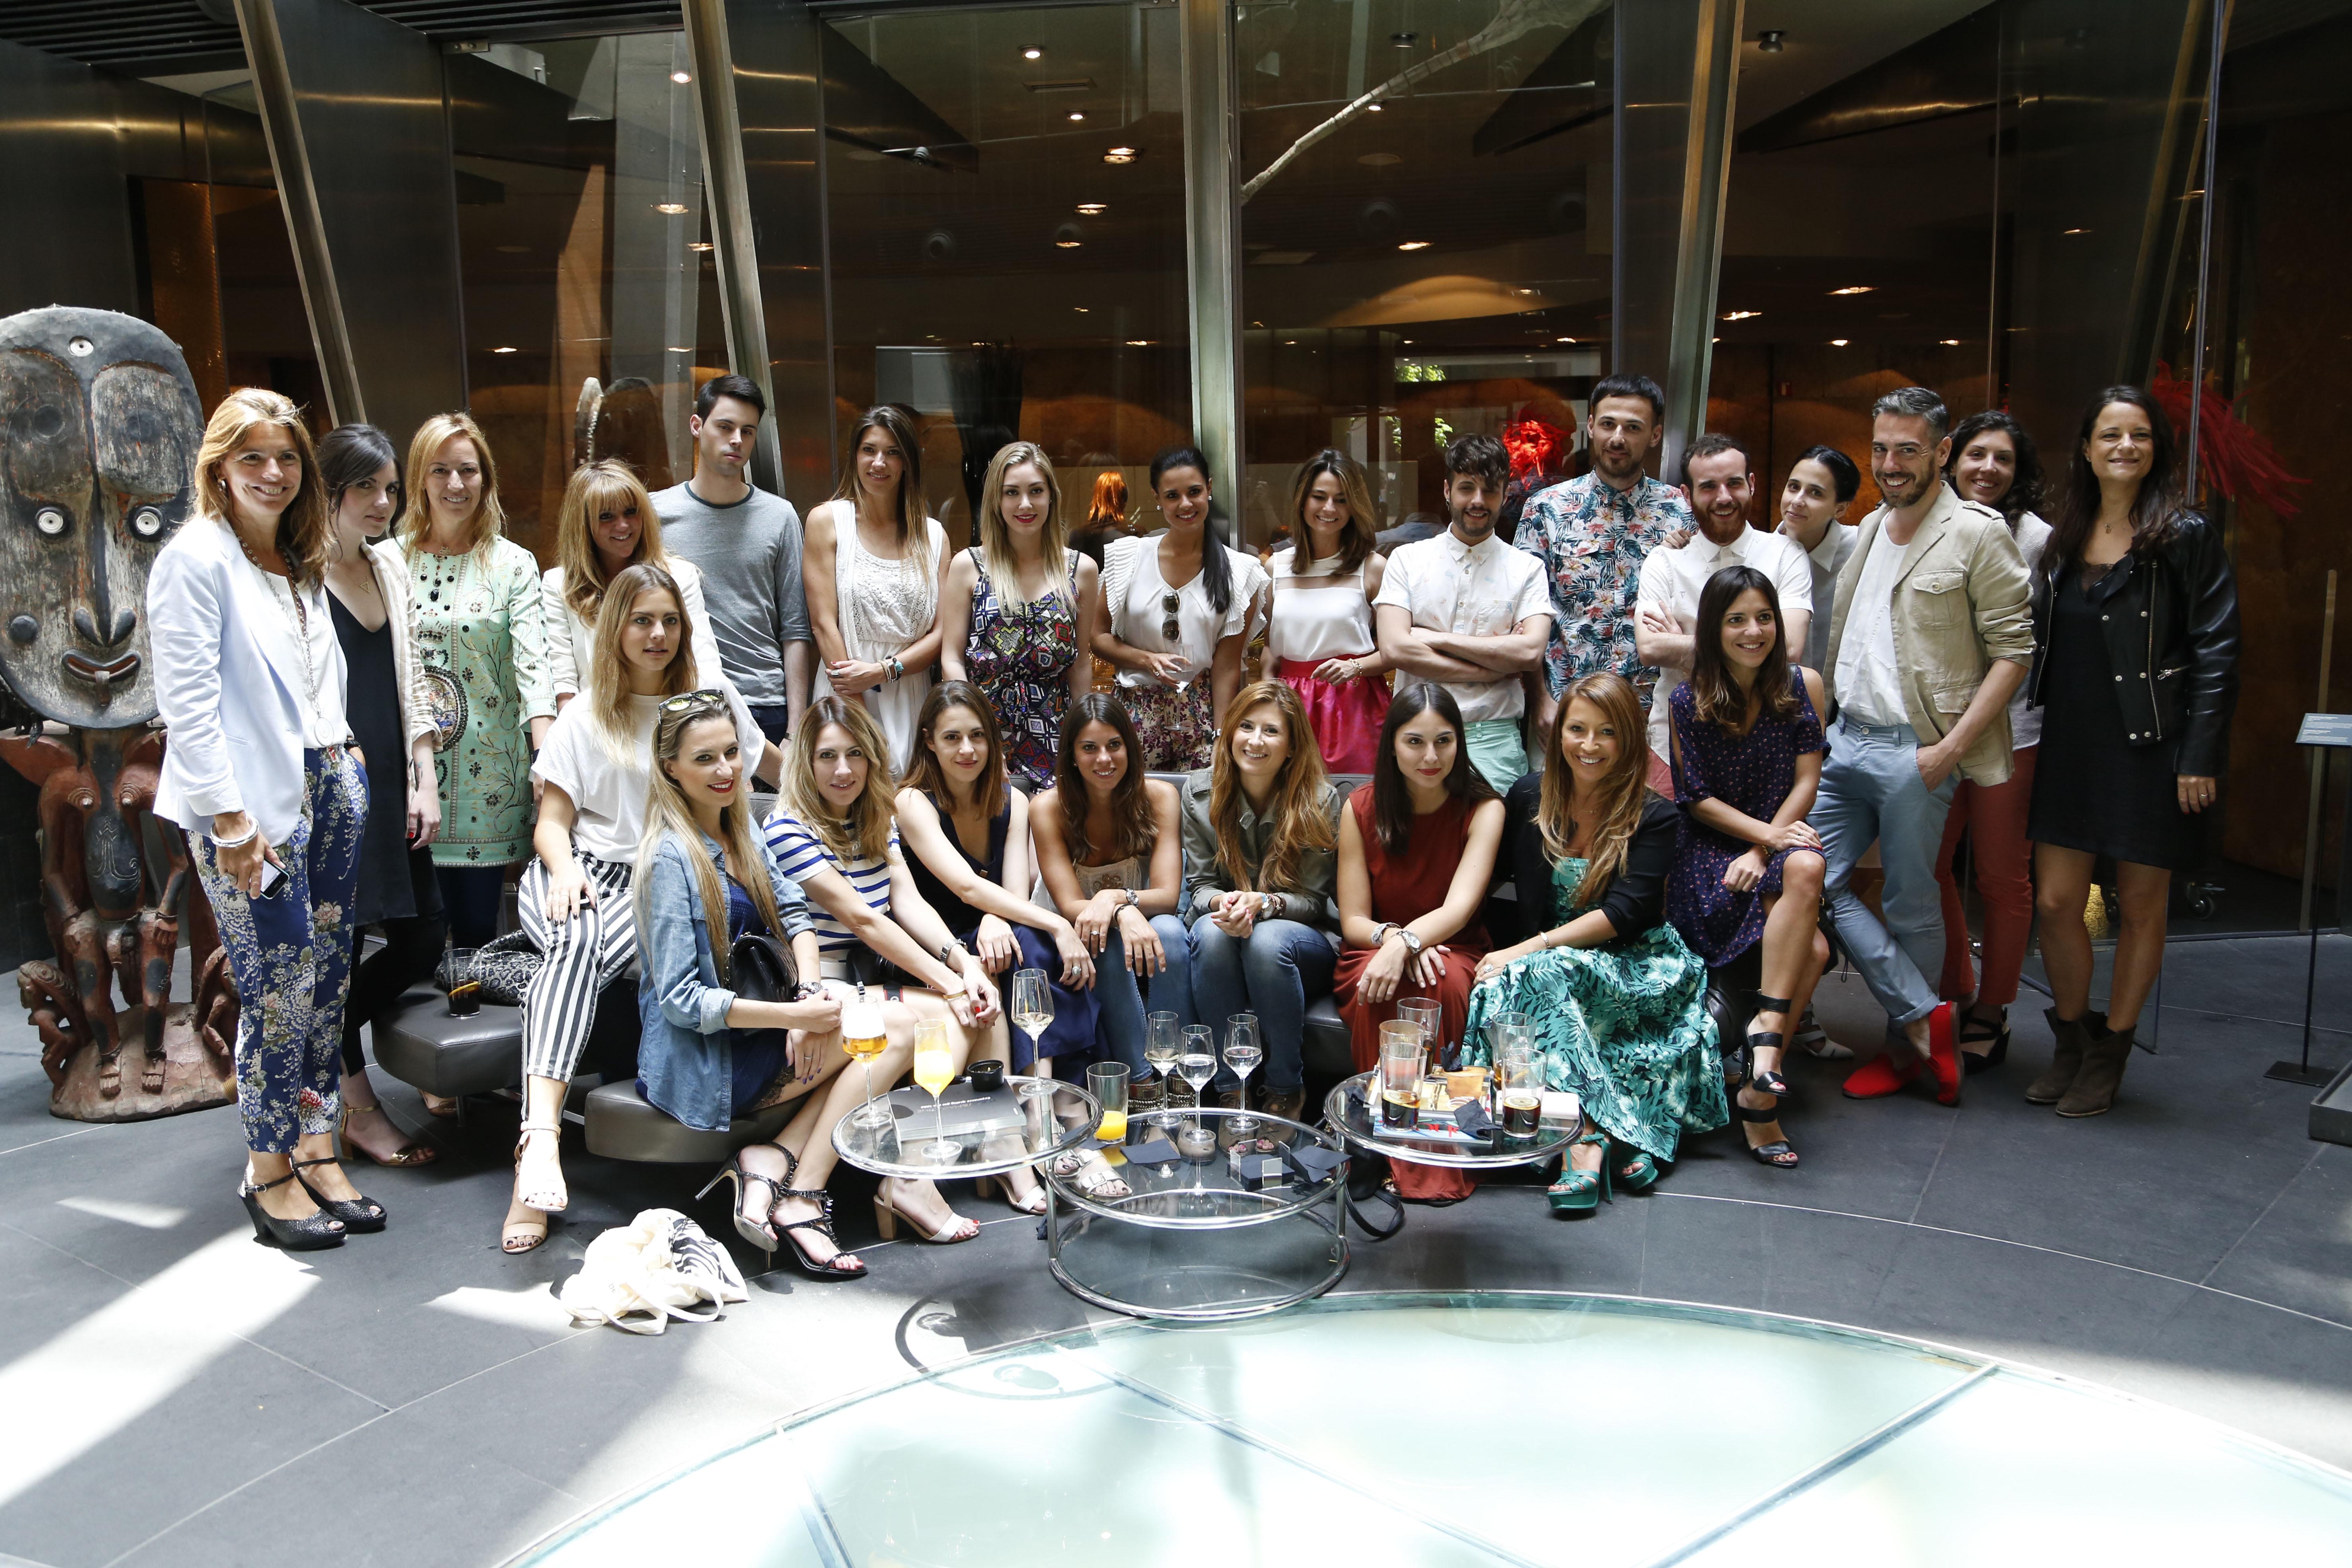 Fashion_And_Bloggers_Date_By_S_Moda_Hotel_Urban_Lara_Martin_Gilarranz_Bymyheels_2